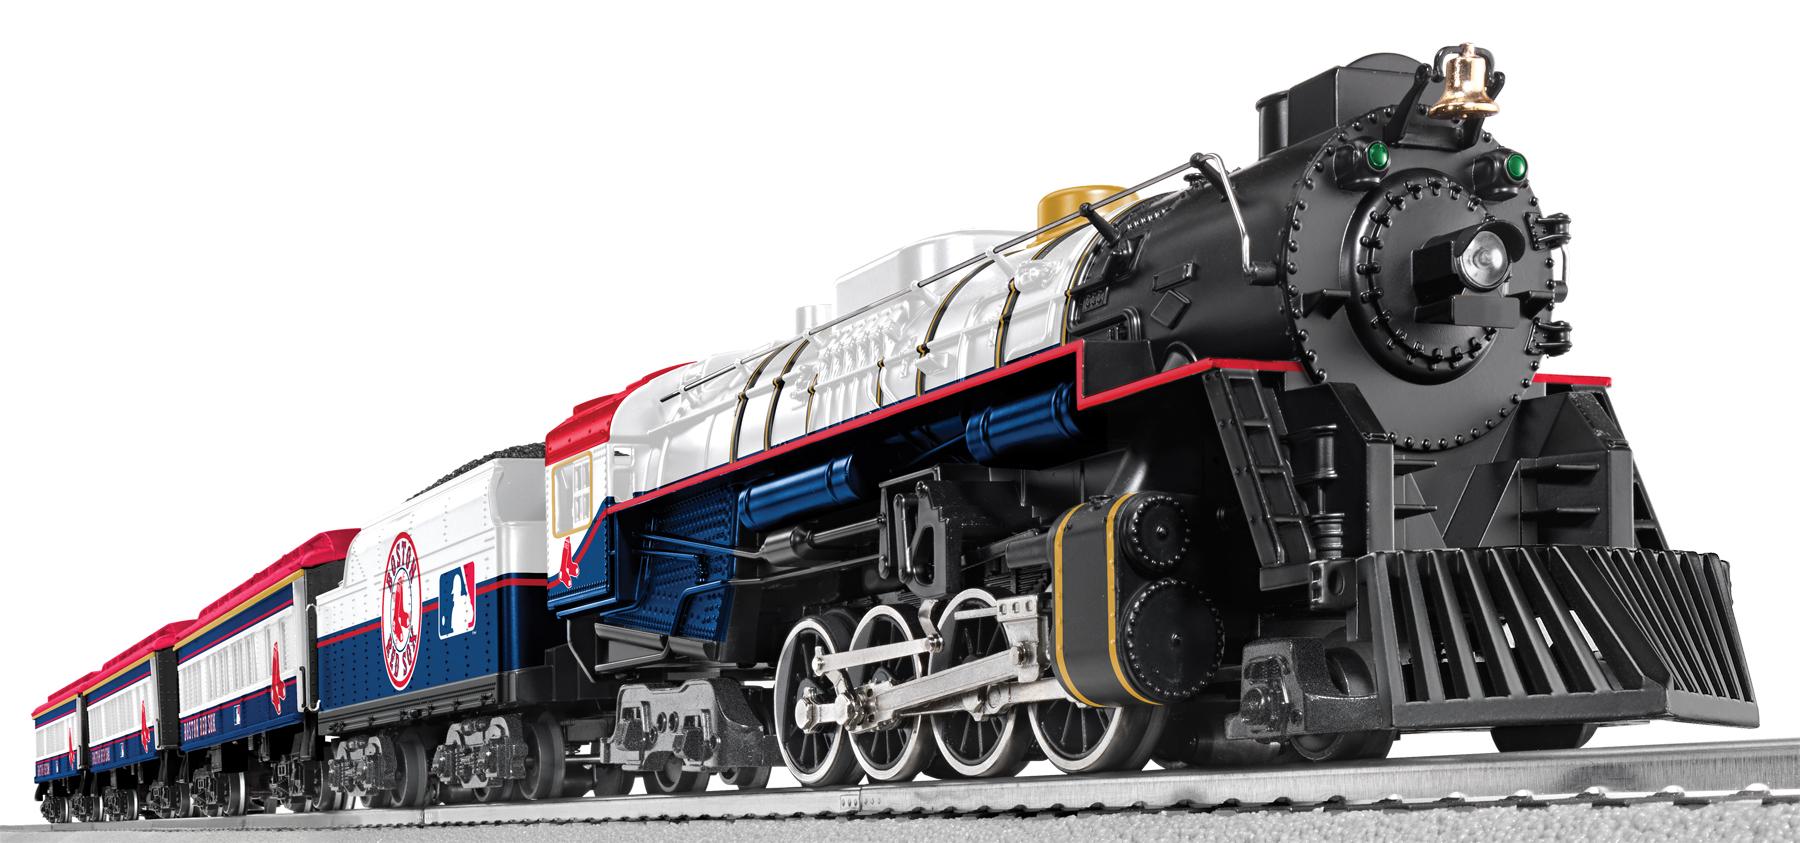 Lionel trains bronx zoo